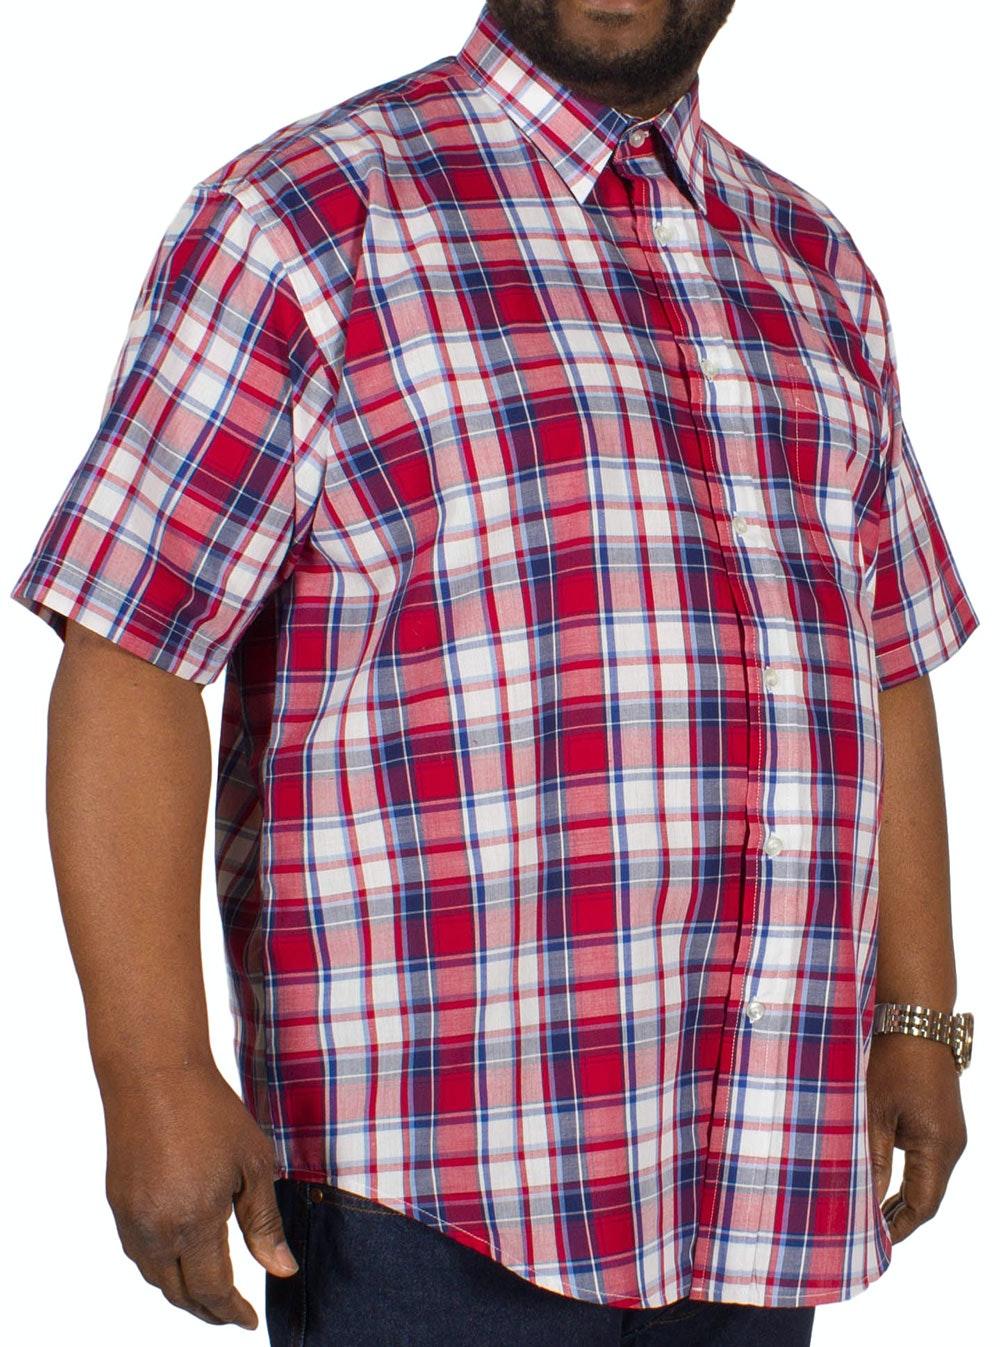 Metaphor Short Sleeve Check Shirt Red/Navy